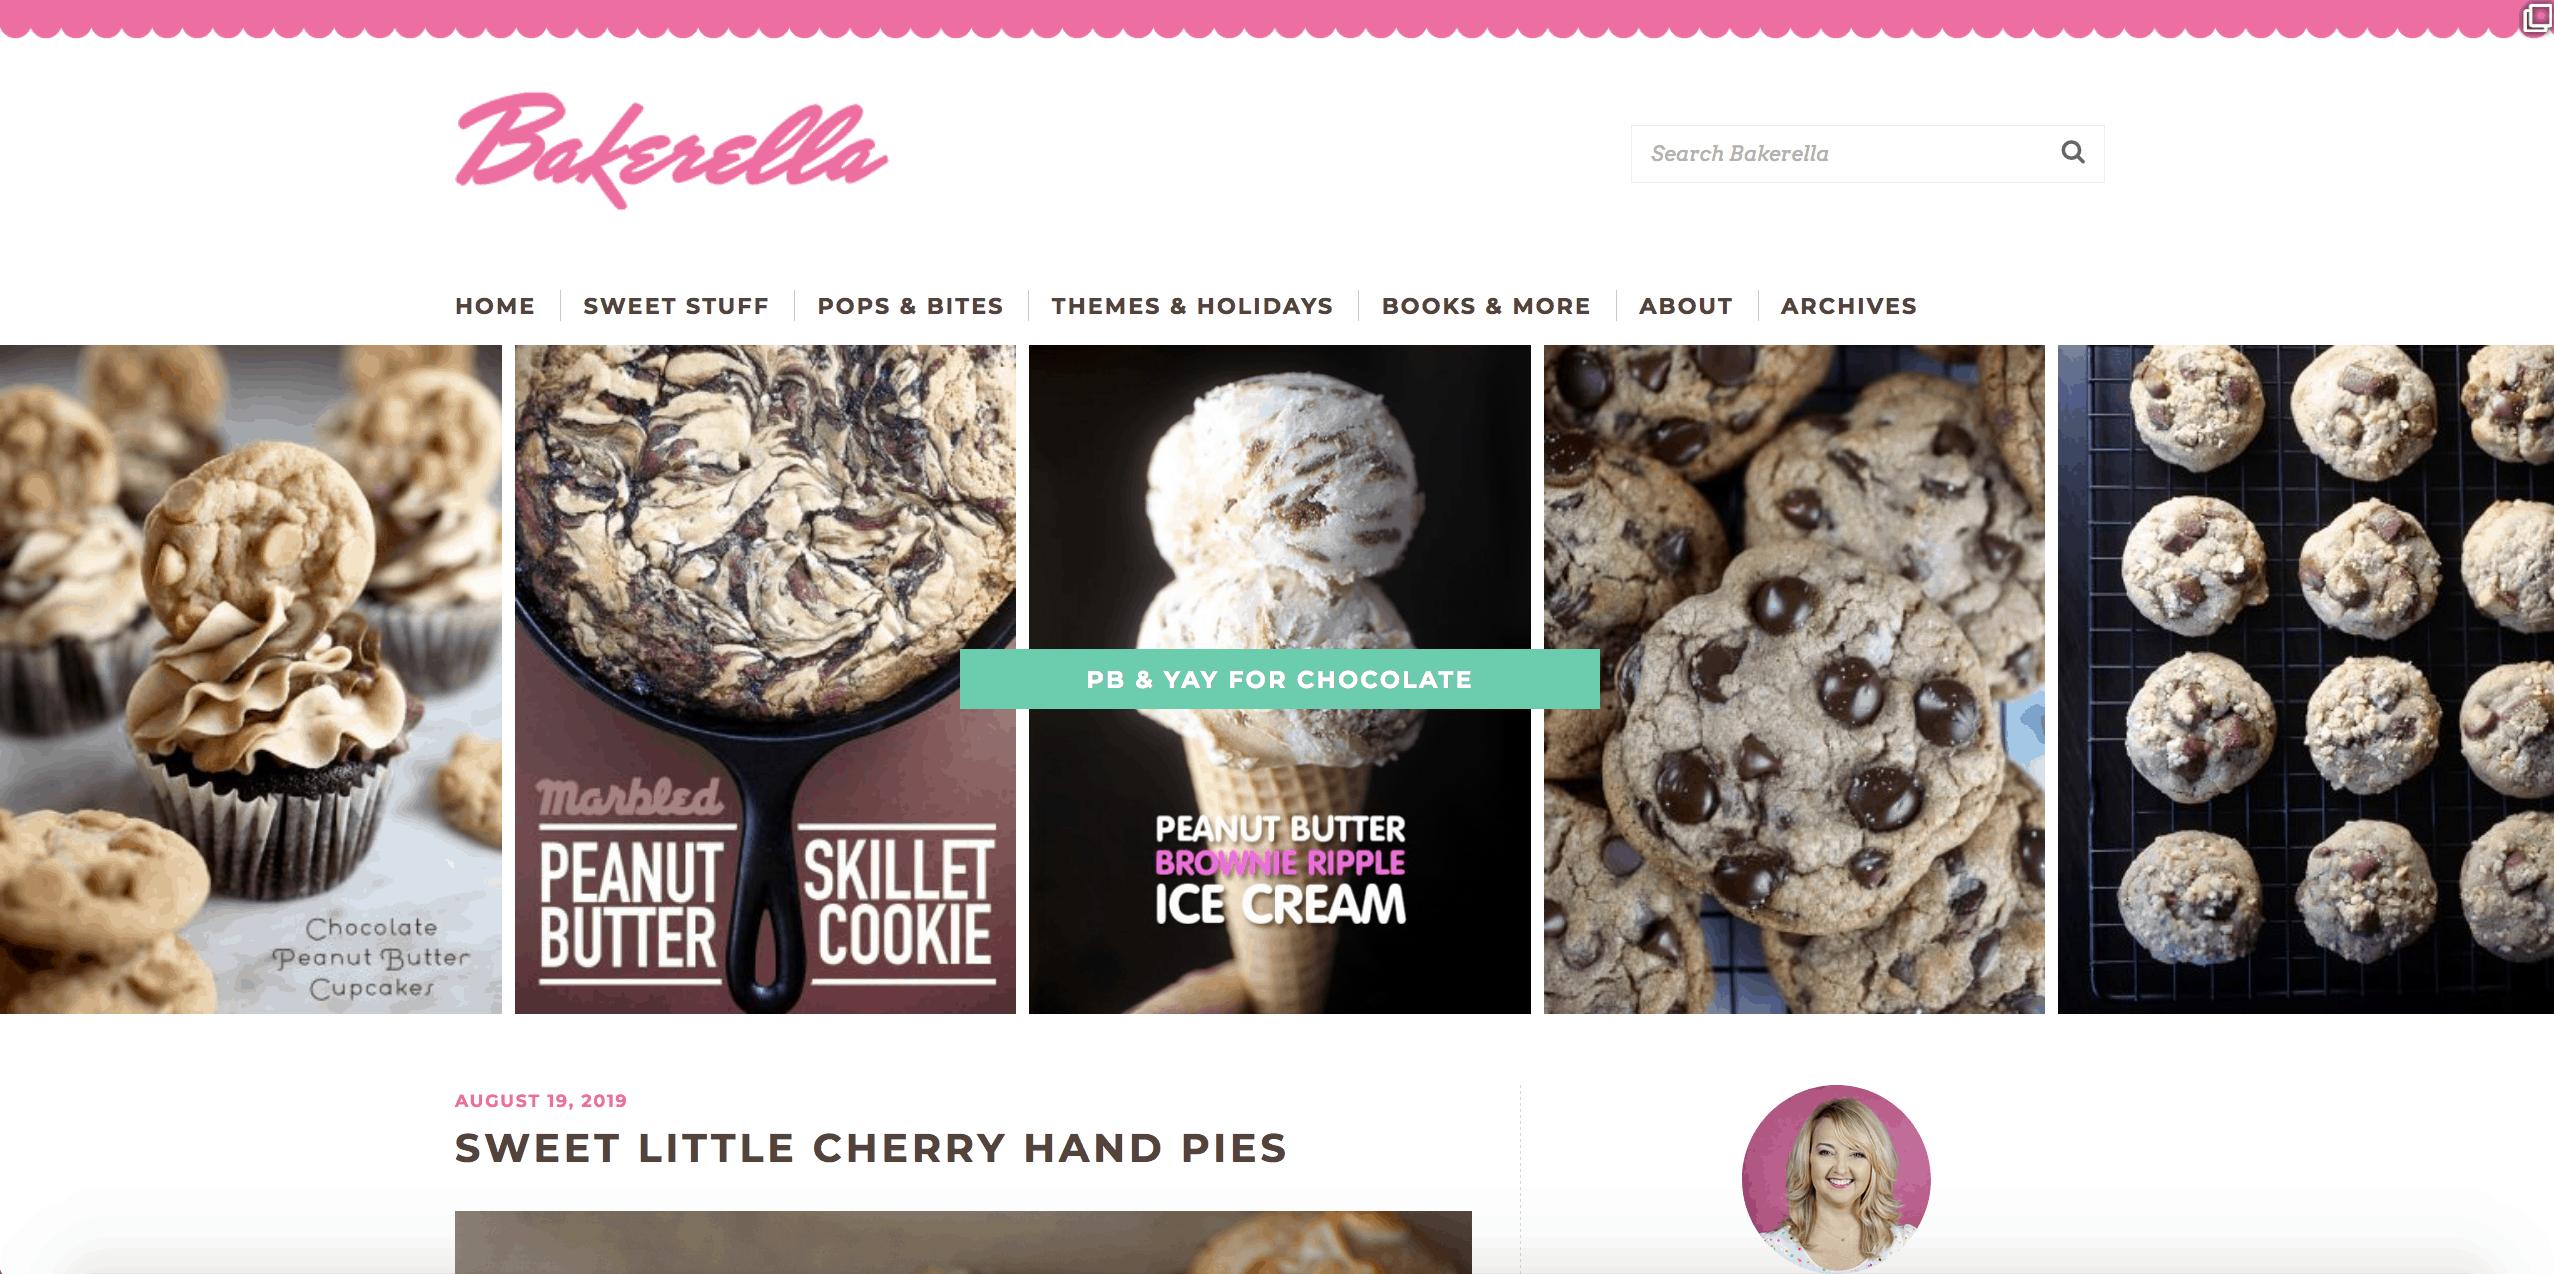 Food Blogs like Bakerella make a lot of money via ads and affiliate marketing.